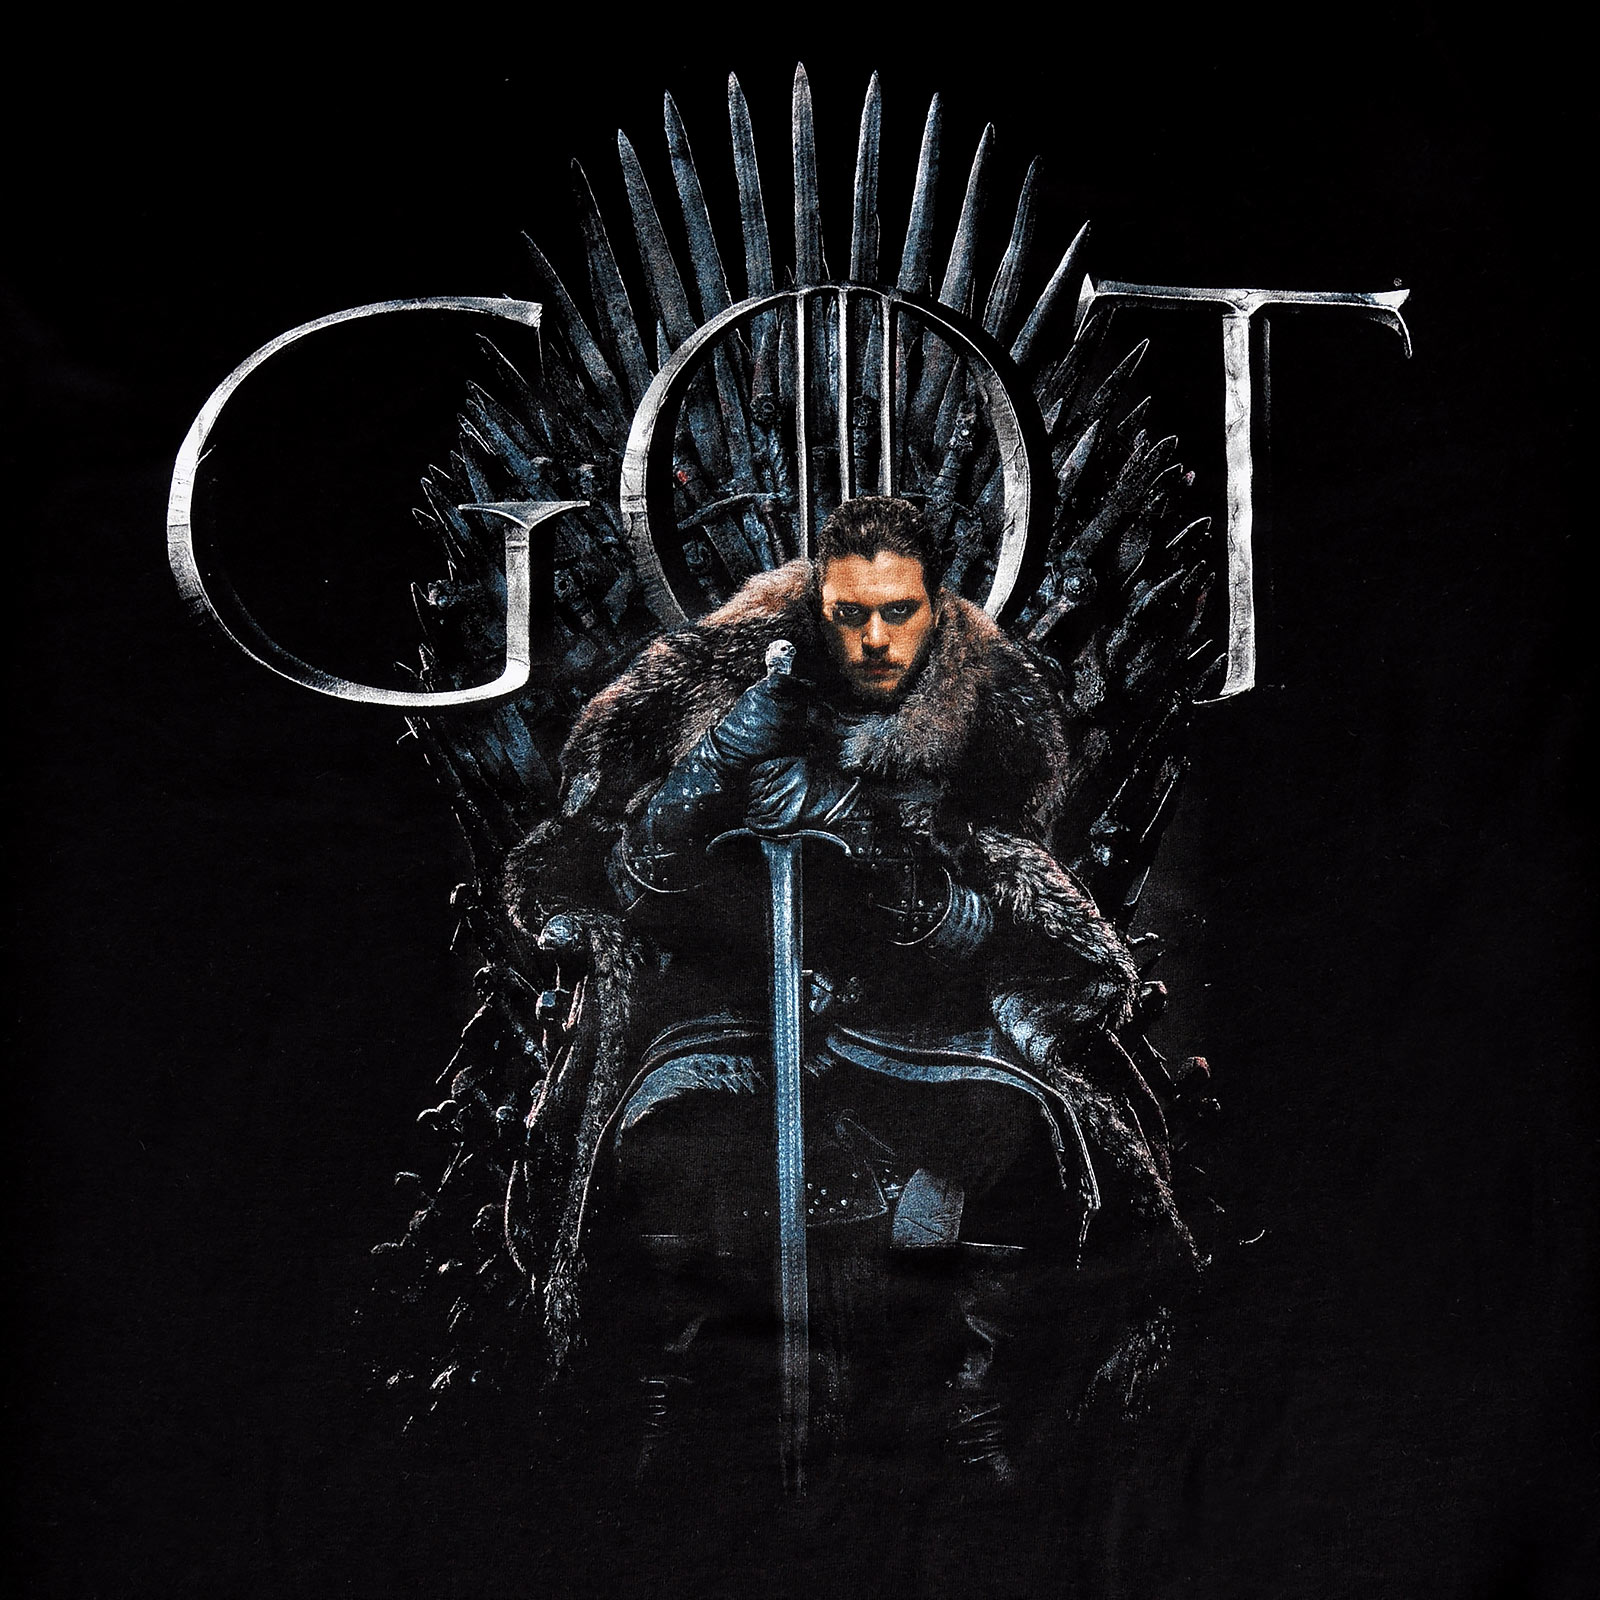 Game of Thrones - Jon Snow For The Throne T-Shirt schwarz